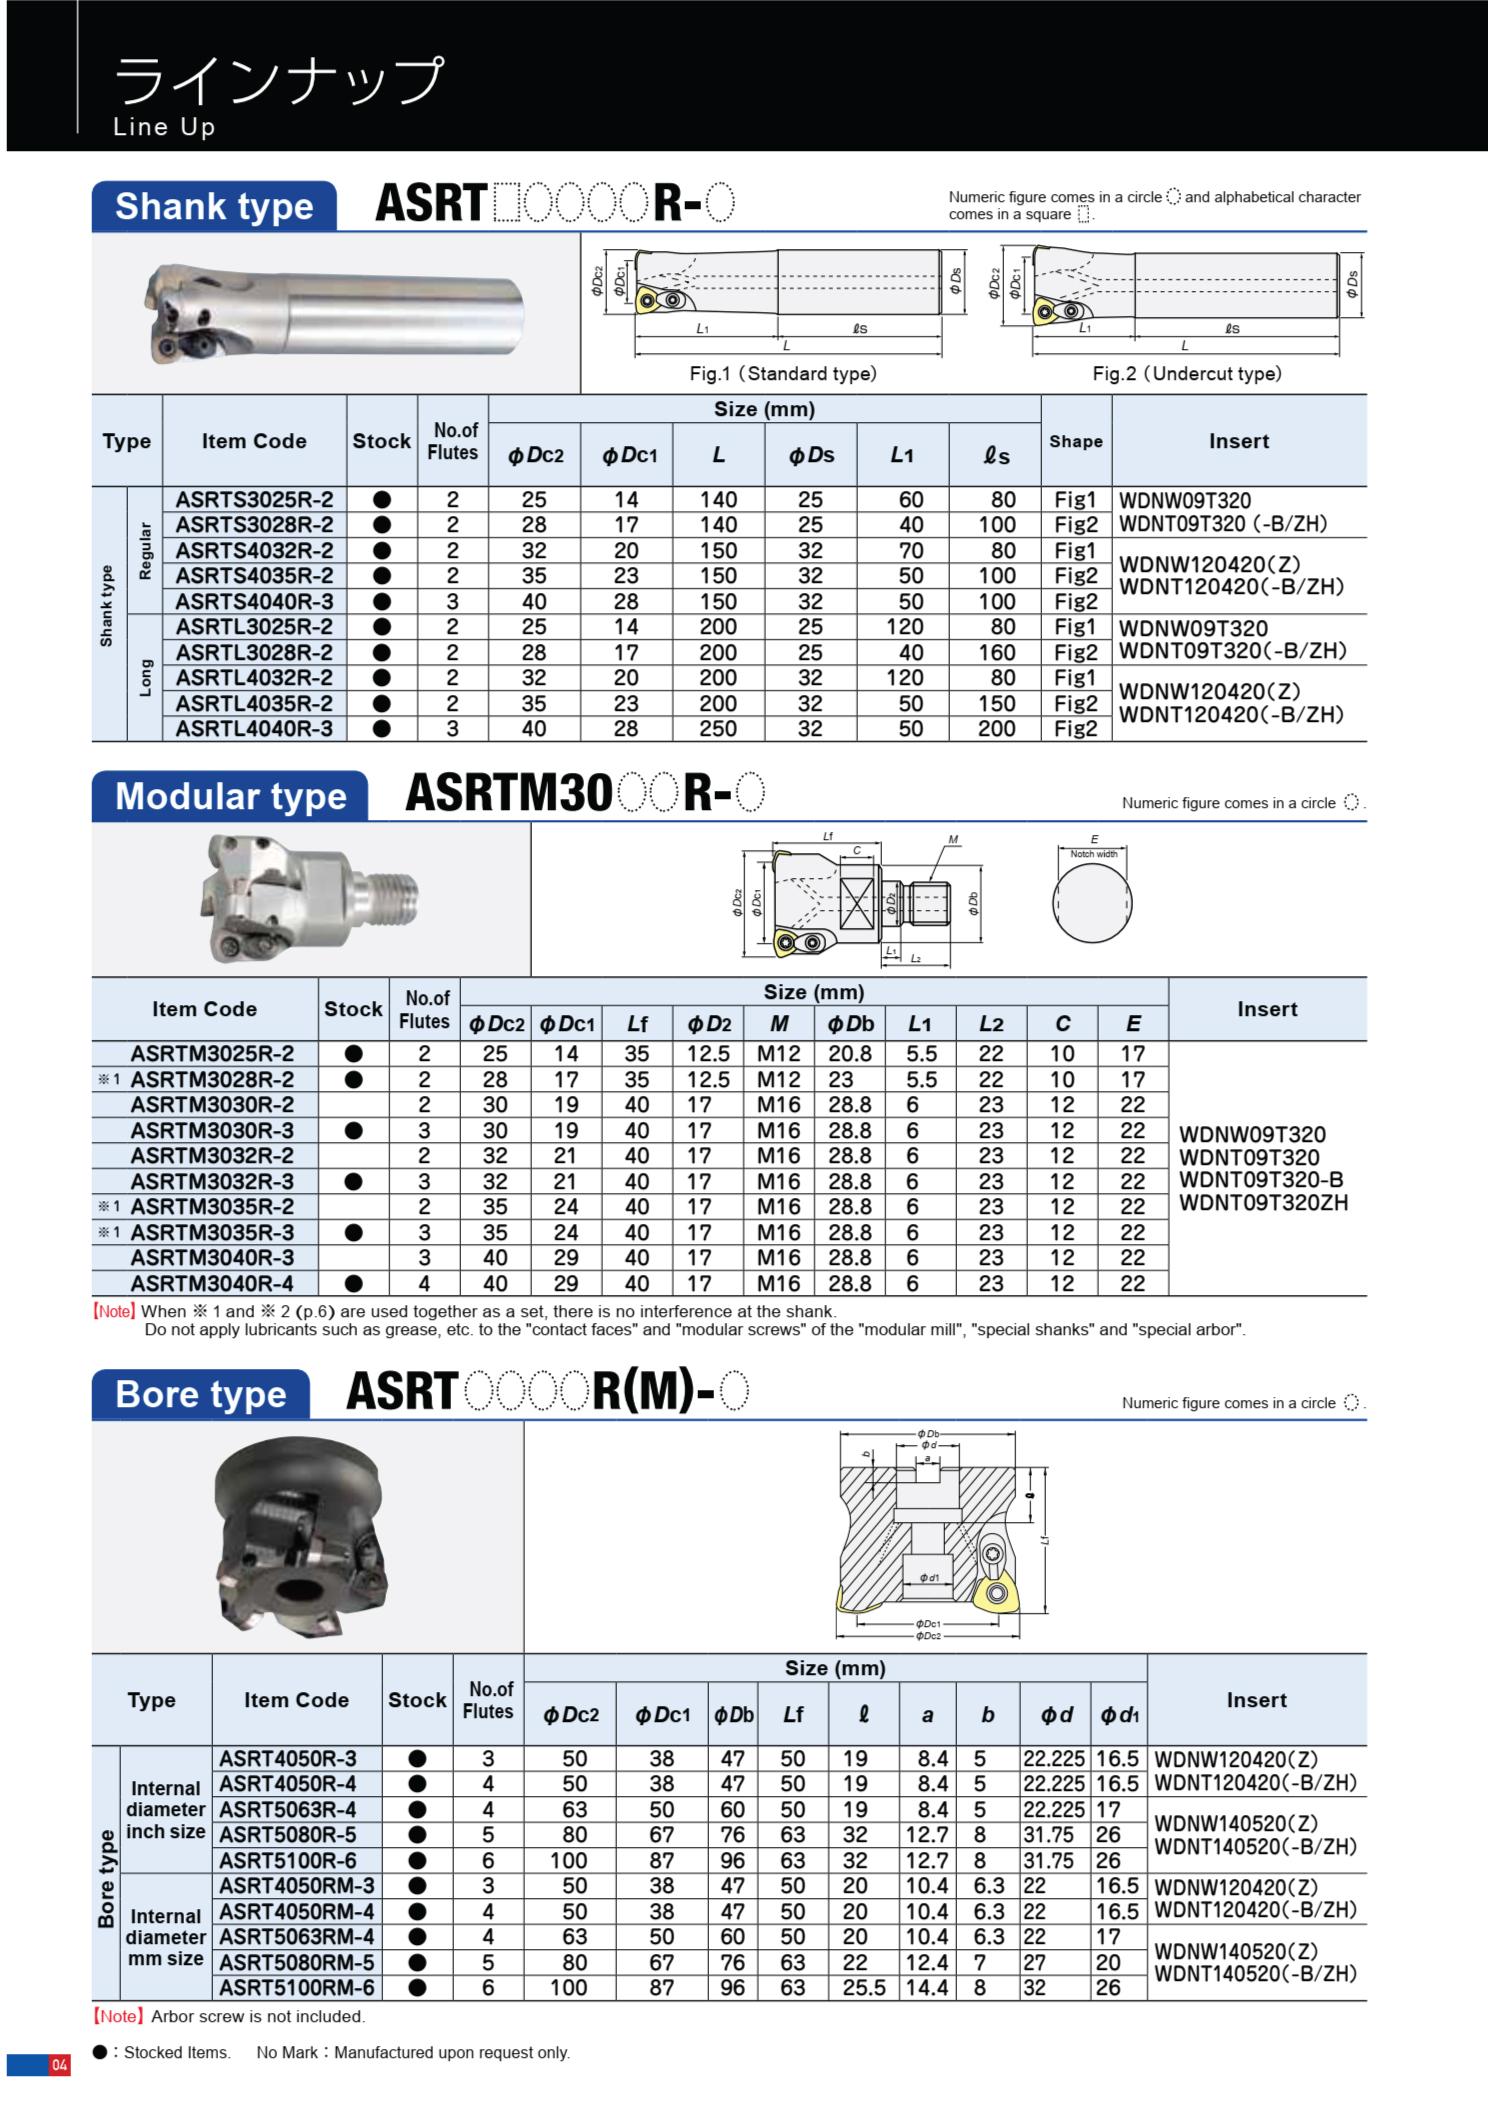 Dao Phay Gắn Mảnh Hitachi Moldino ASRT 4